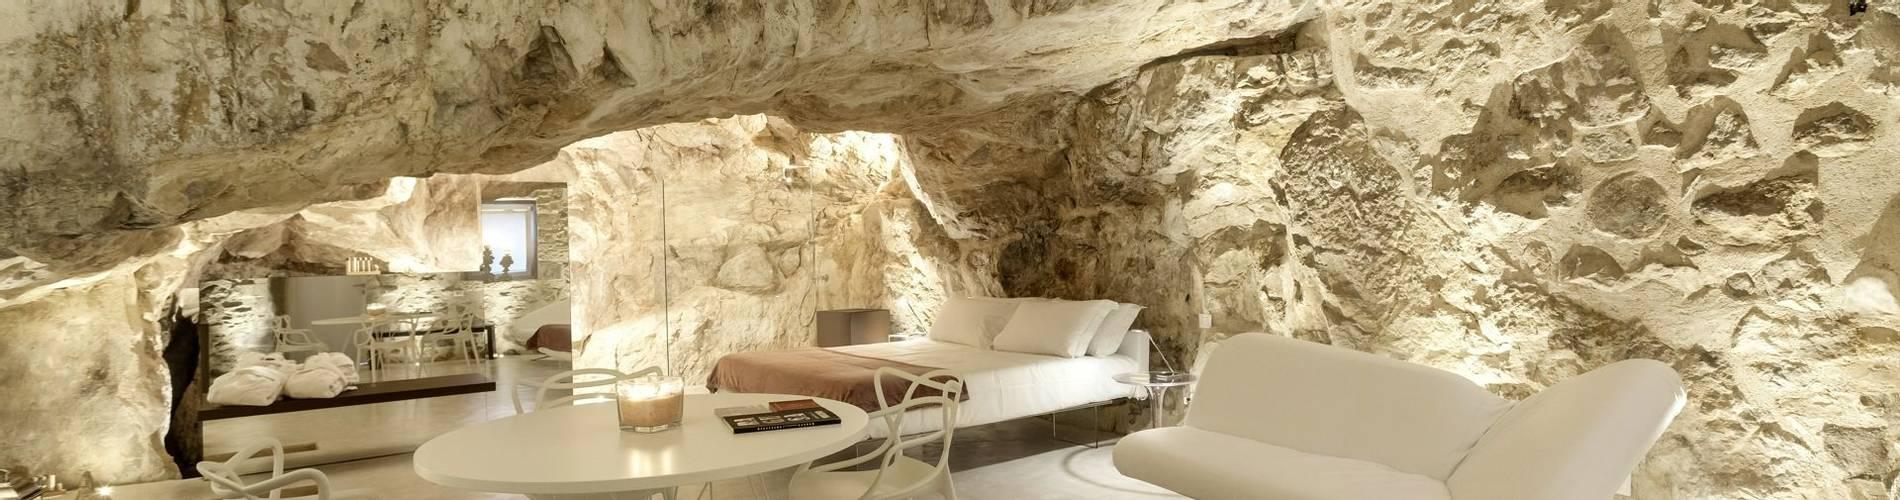 Locanda Don Serafino, Sicily, Italy, Luxury Suite (6).jpg